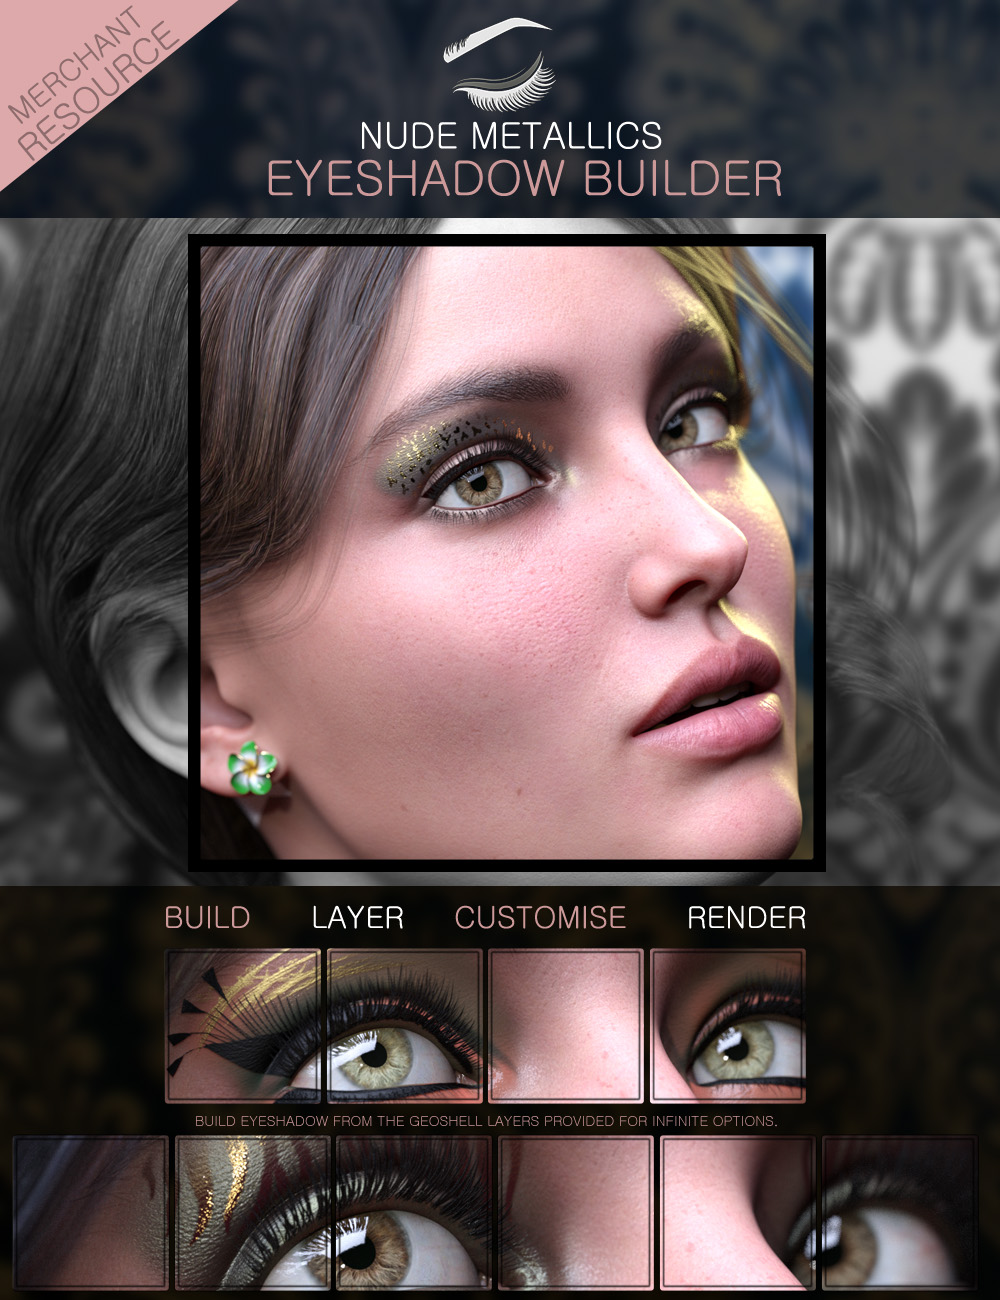 Nude Metallics Eyeshadow Builder Genesis 8 Females Merchant Resource by: ForbiddenWhispers, 3D Models by Daz 3D